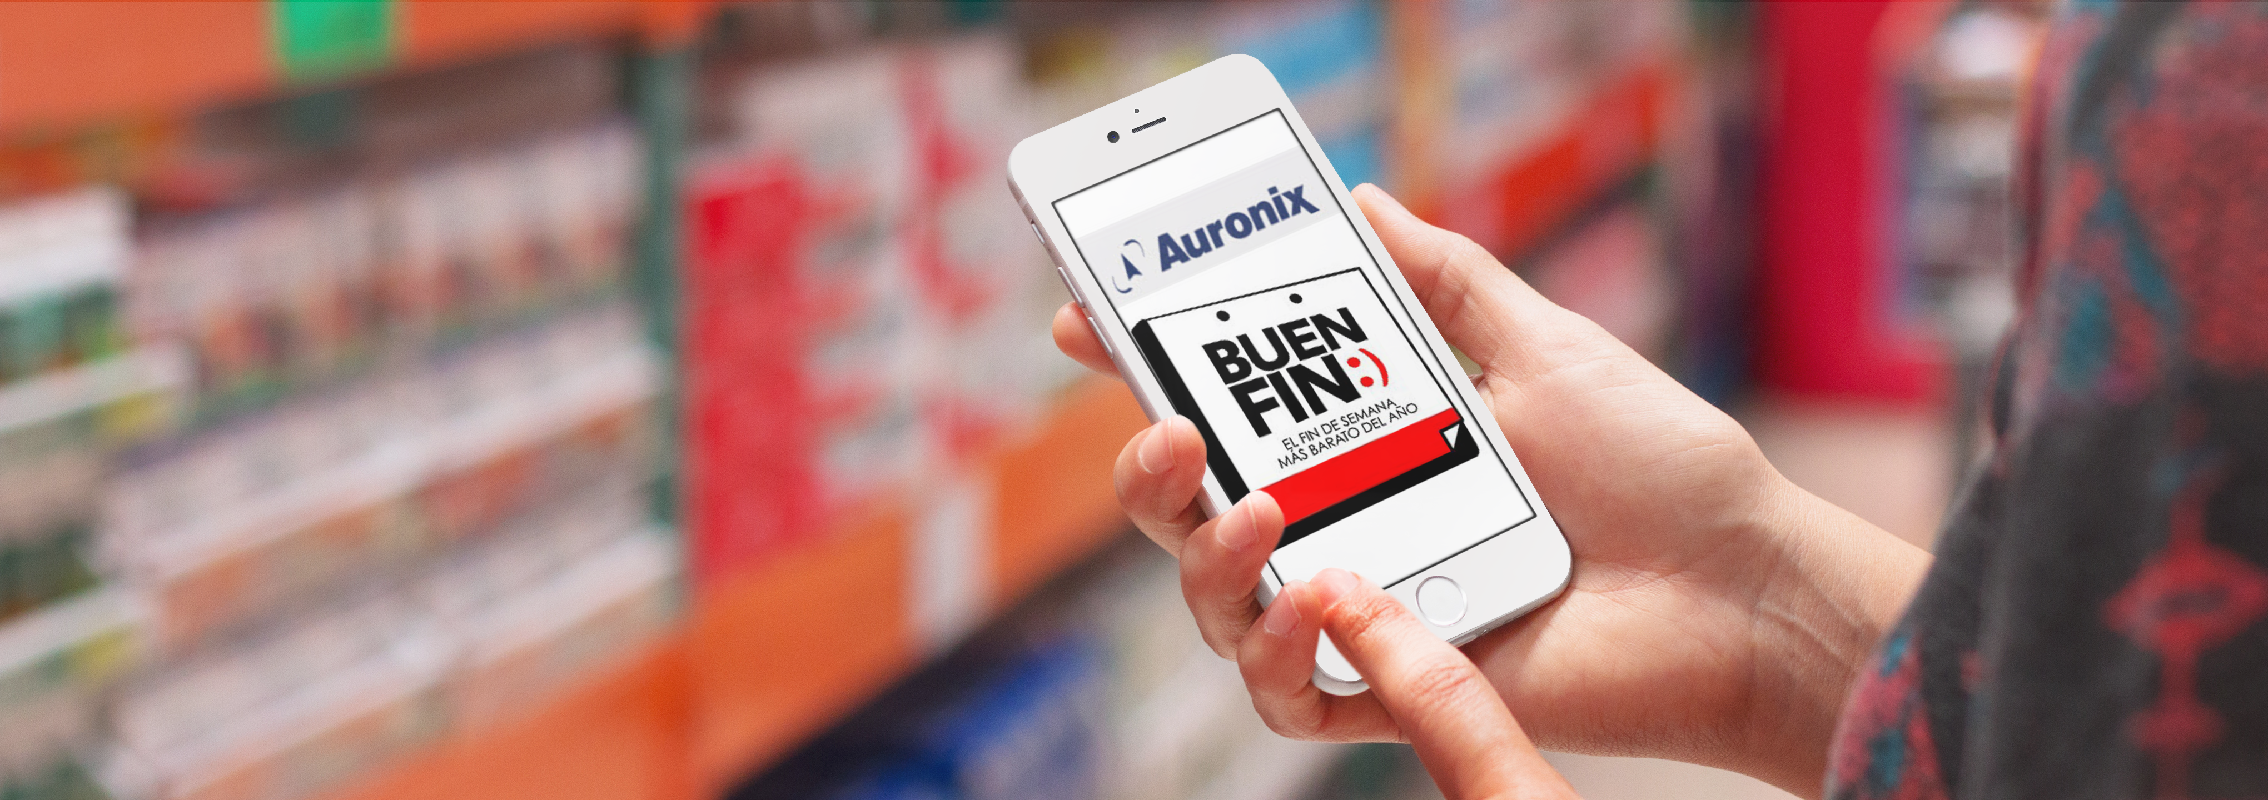 Auronix Buen Fin SMS